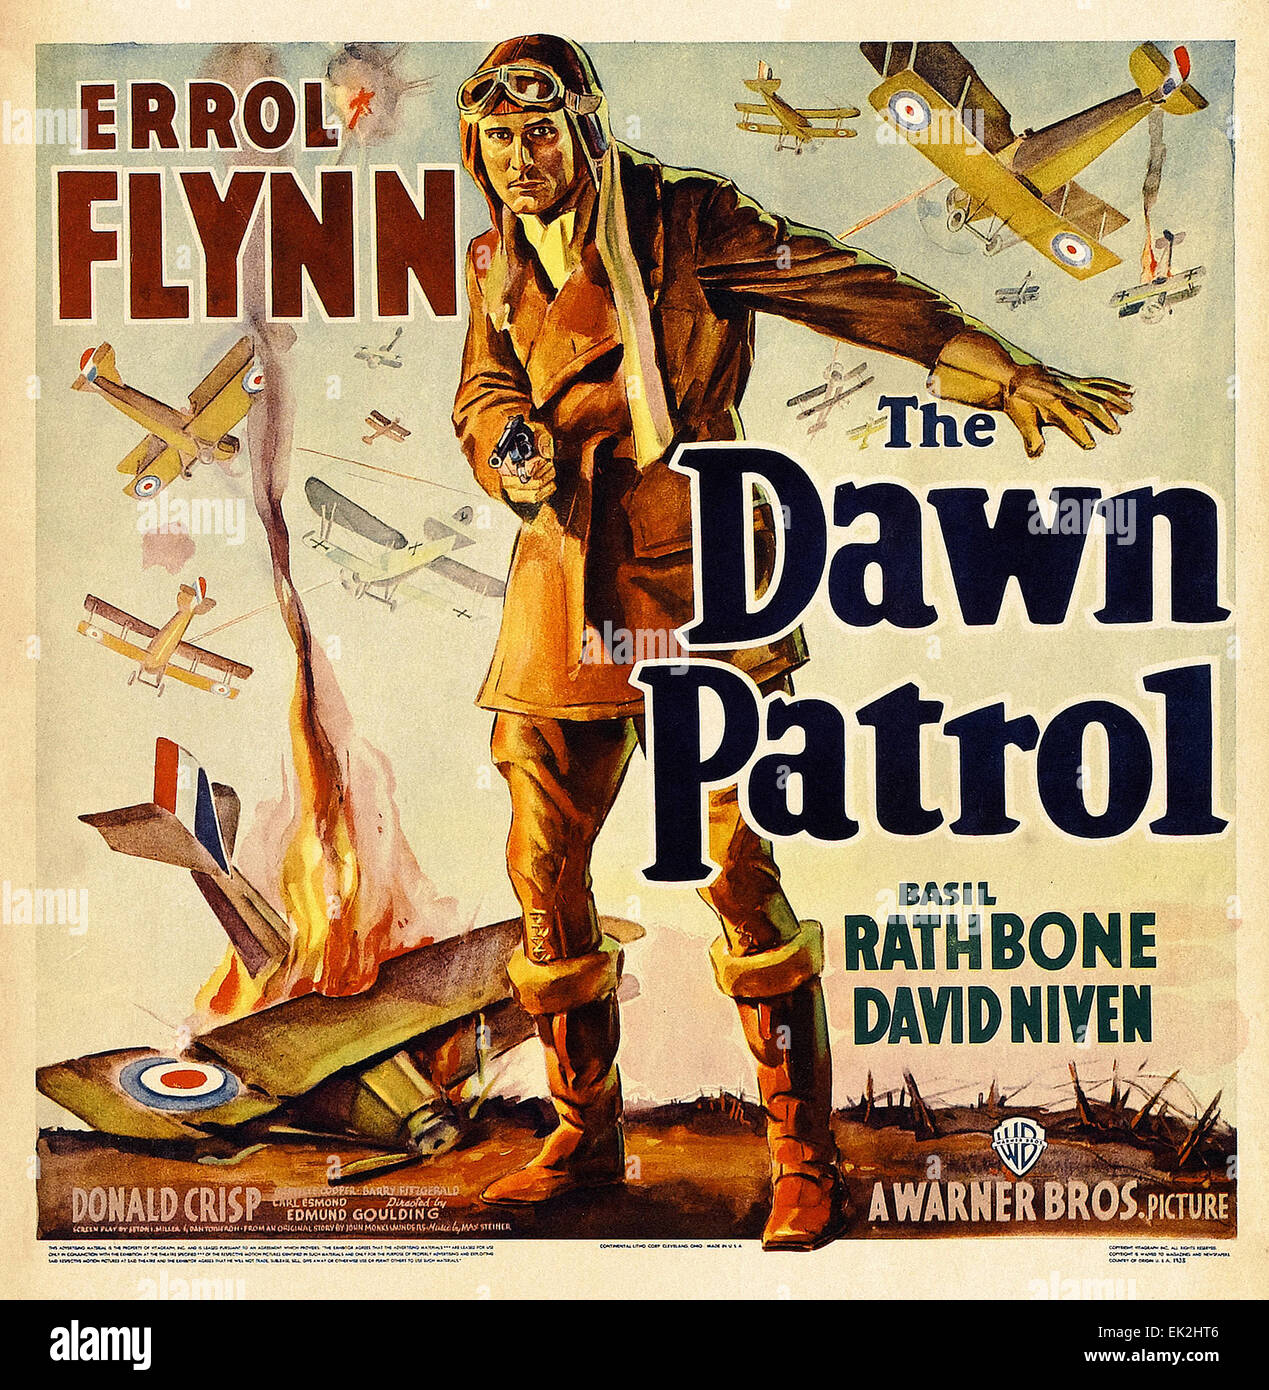 The Dawn Patrol  - Movie Poster - Stock Image